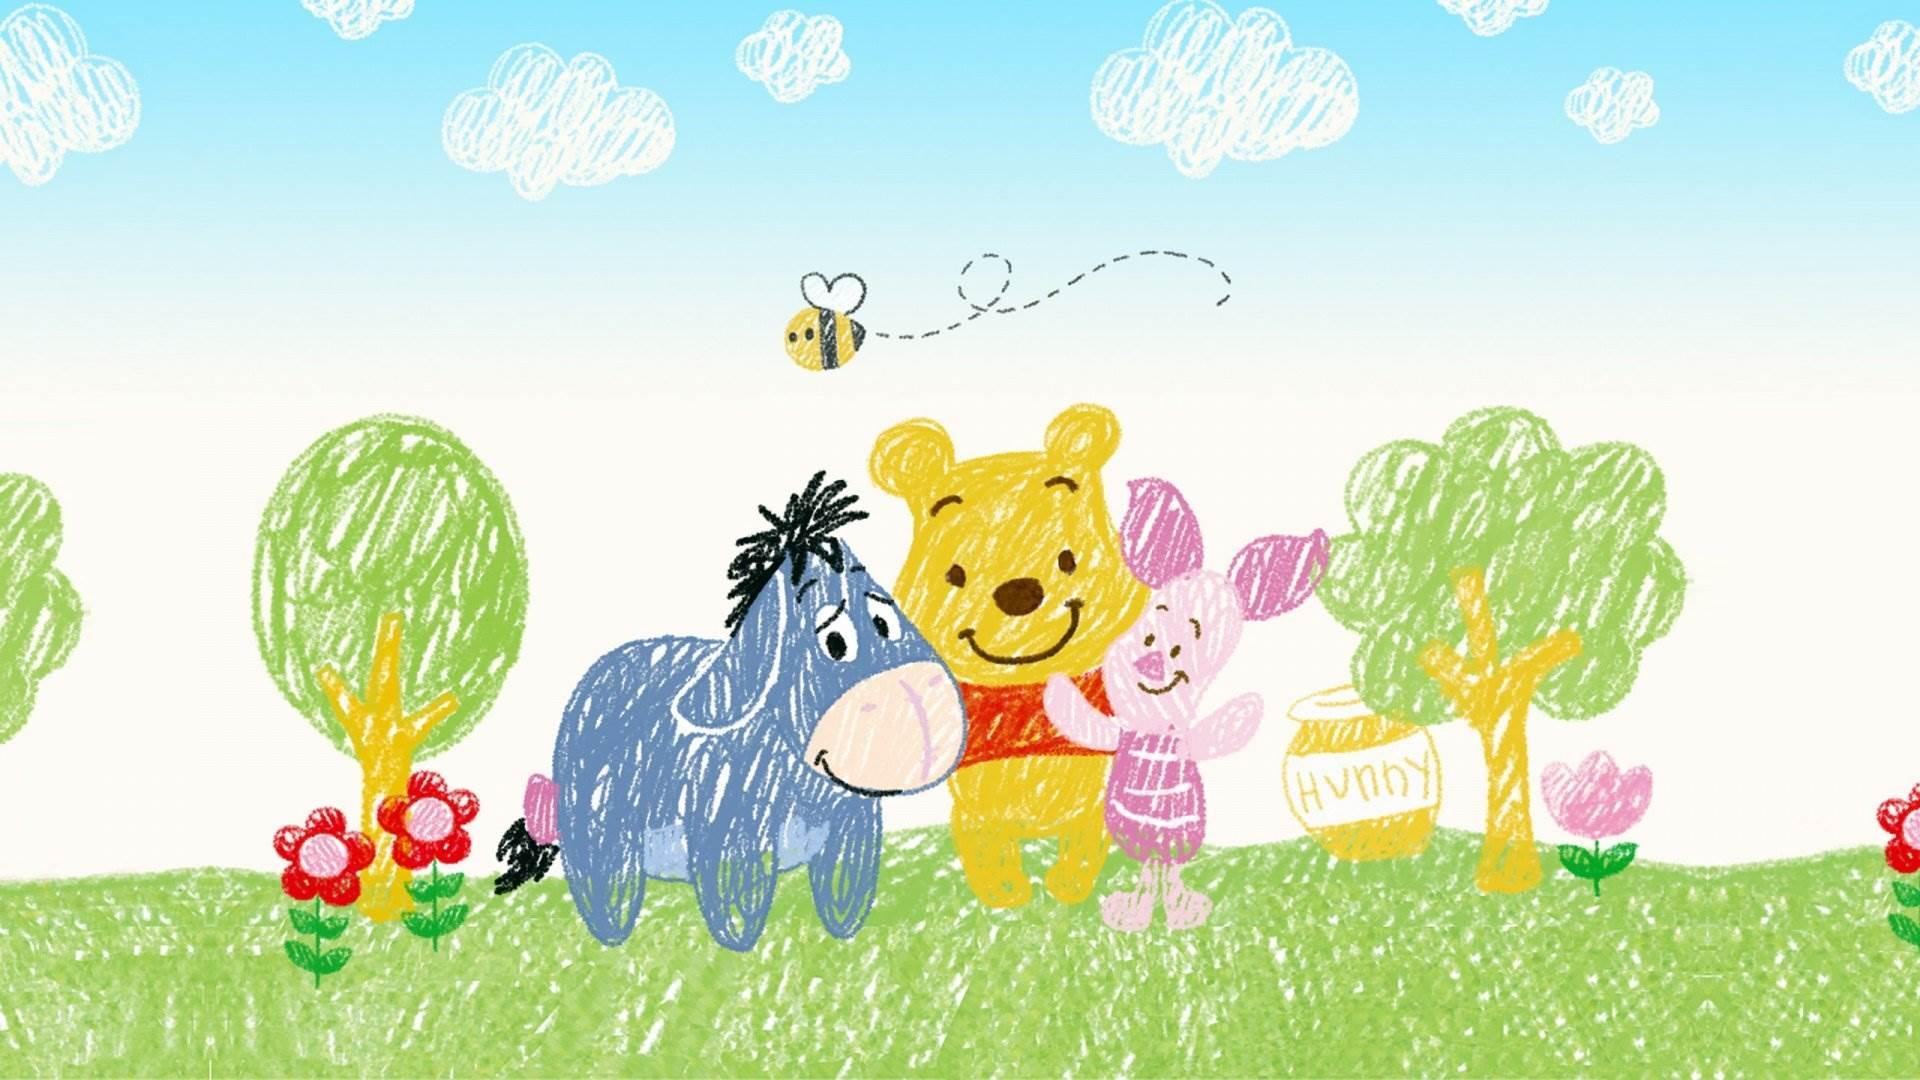 Pooh Bear Iphone Wallpaper Disney Winnie The Pooh Wallpapers 46 Wallpapers